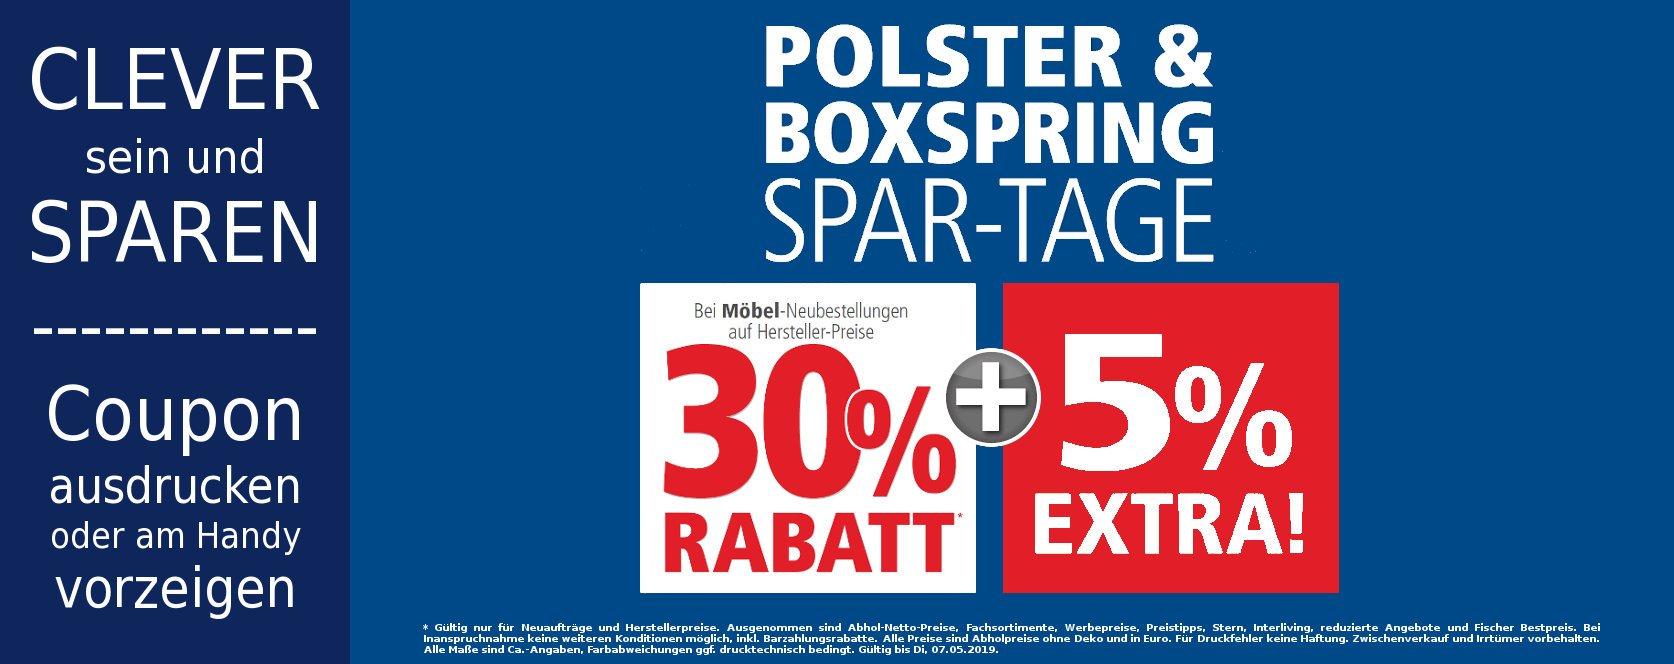 Polstermöbel-Boxspring-Spartage